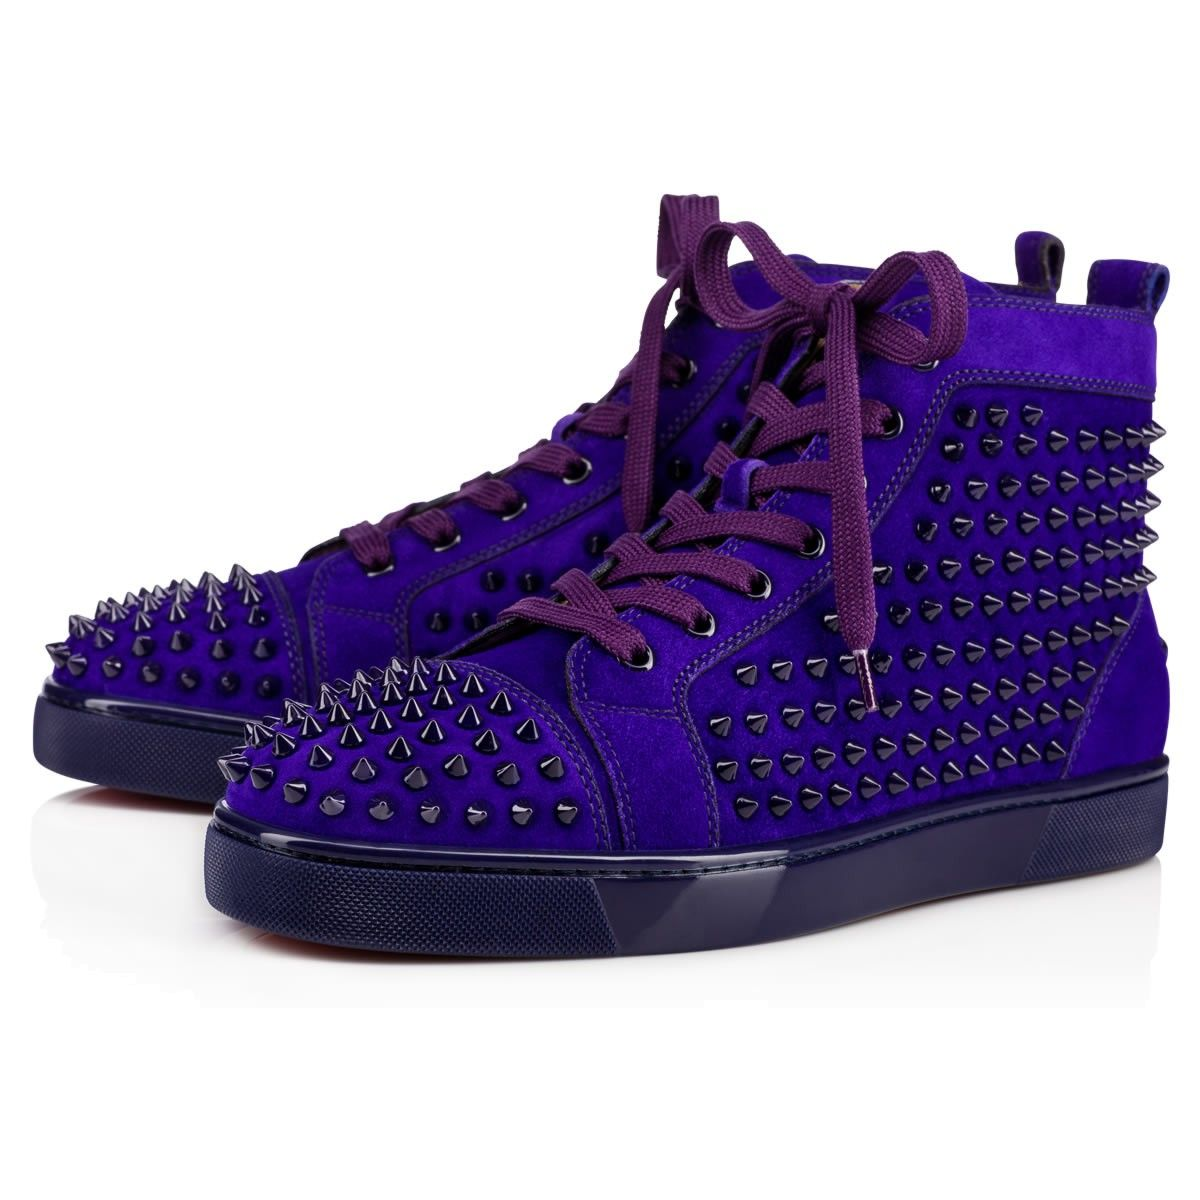 buy online 4186c ec764 CHRISTIAN LOUBOUTIN Louis Veau Velours/Spikes Purple Pop ...